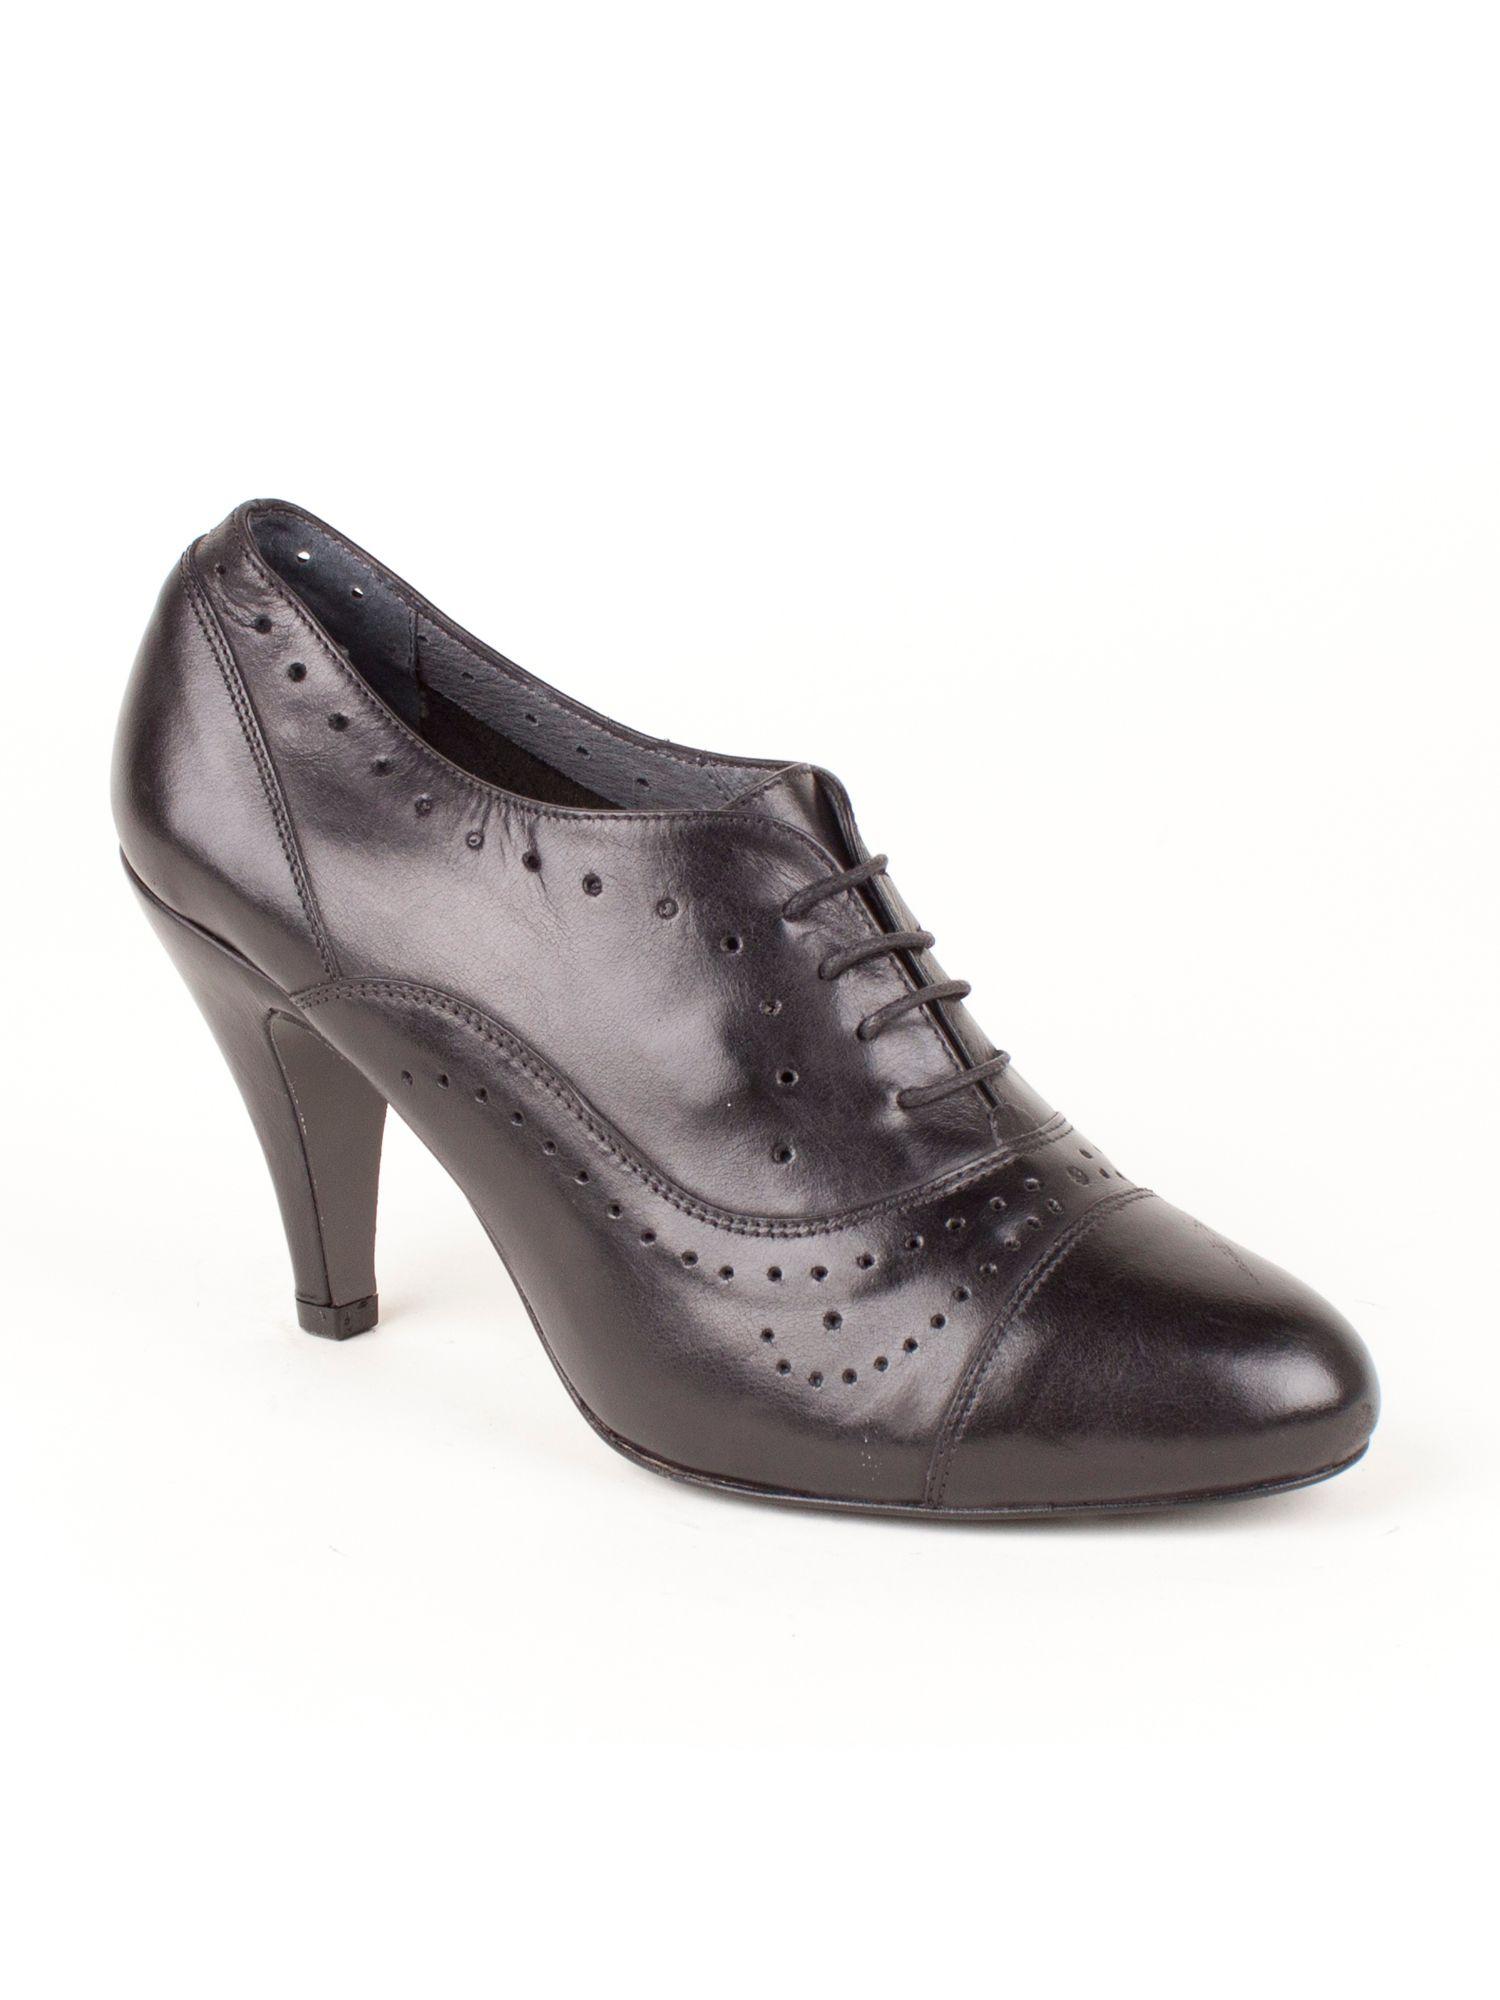 jones bootmaker cailin high heeled court shoe in black lyst